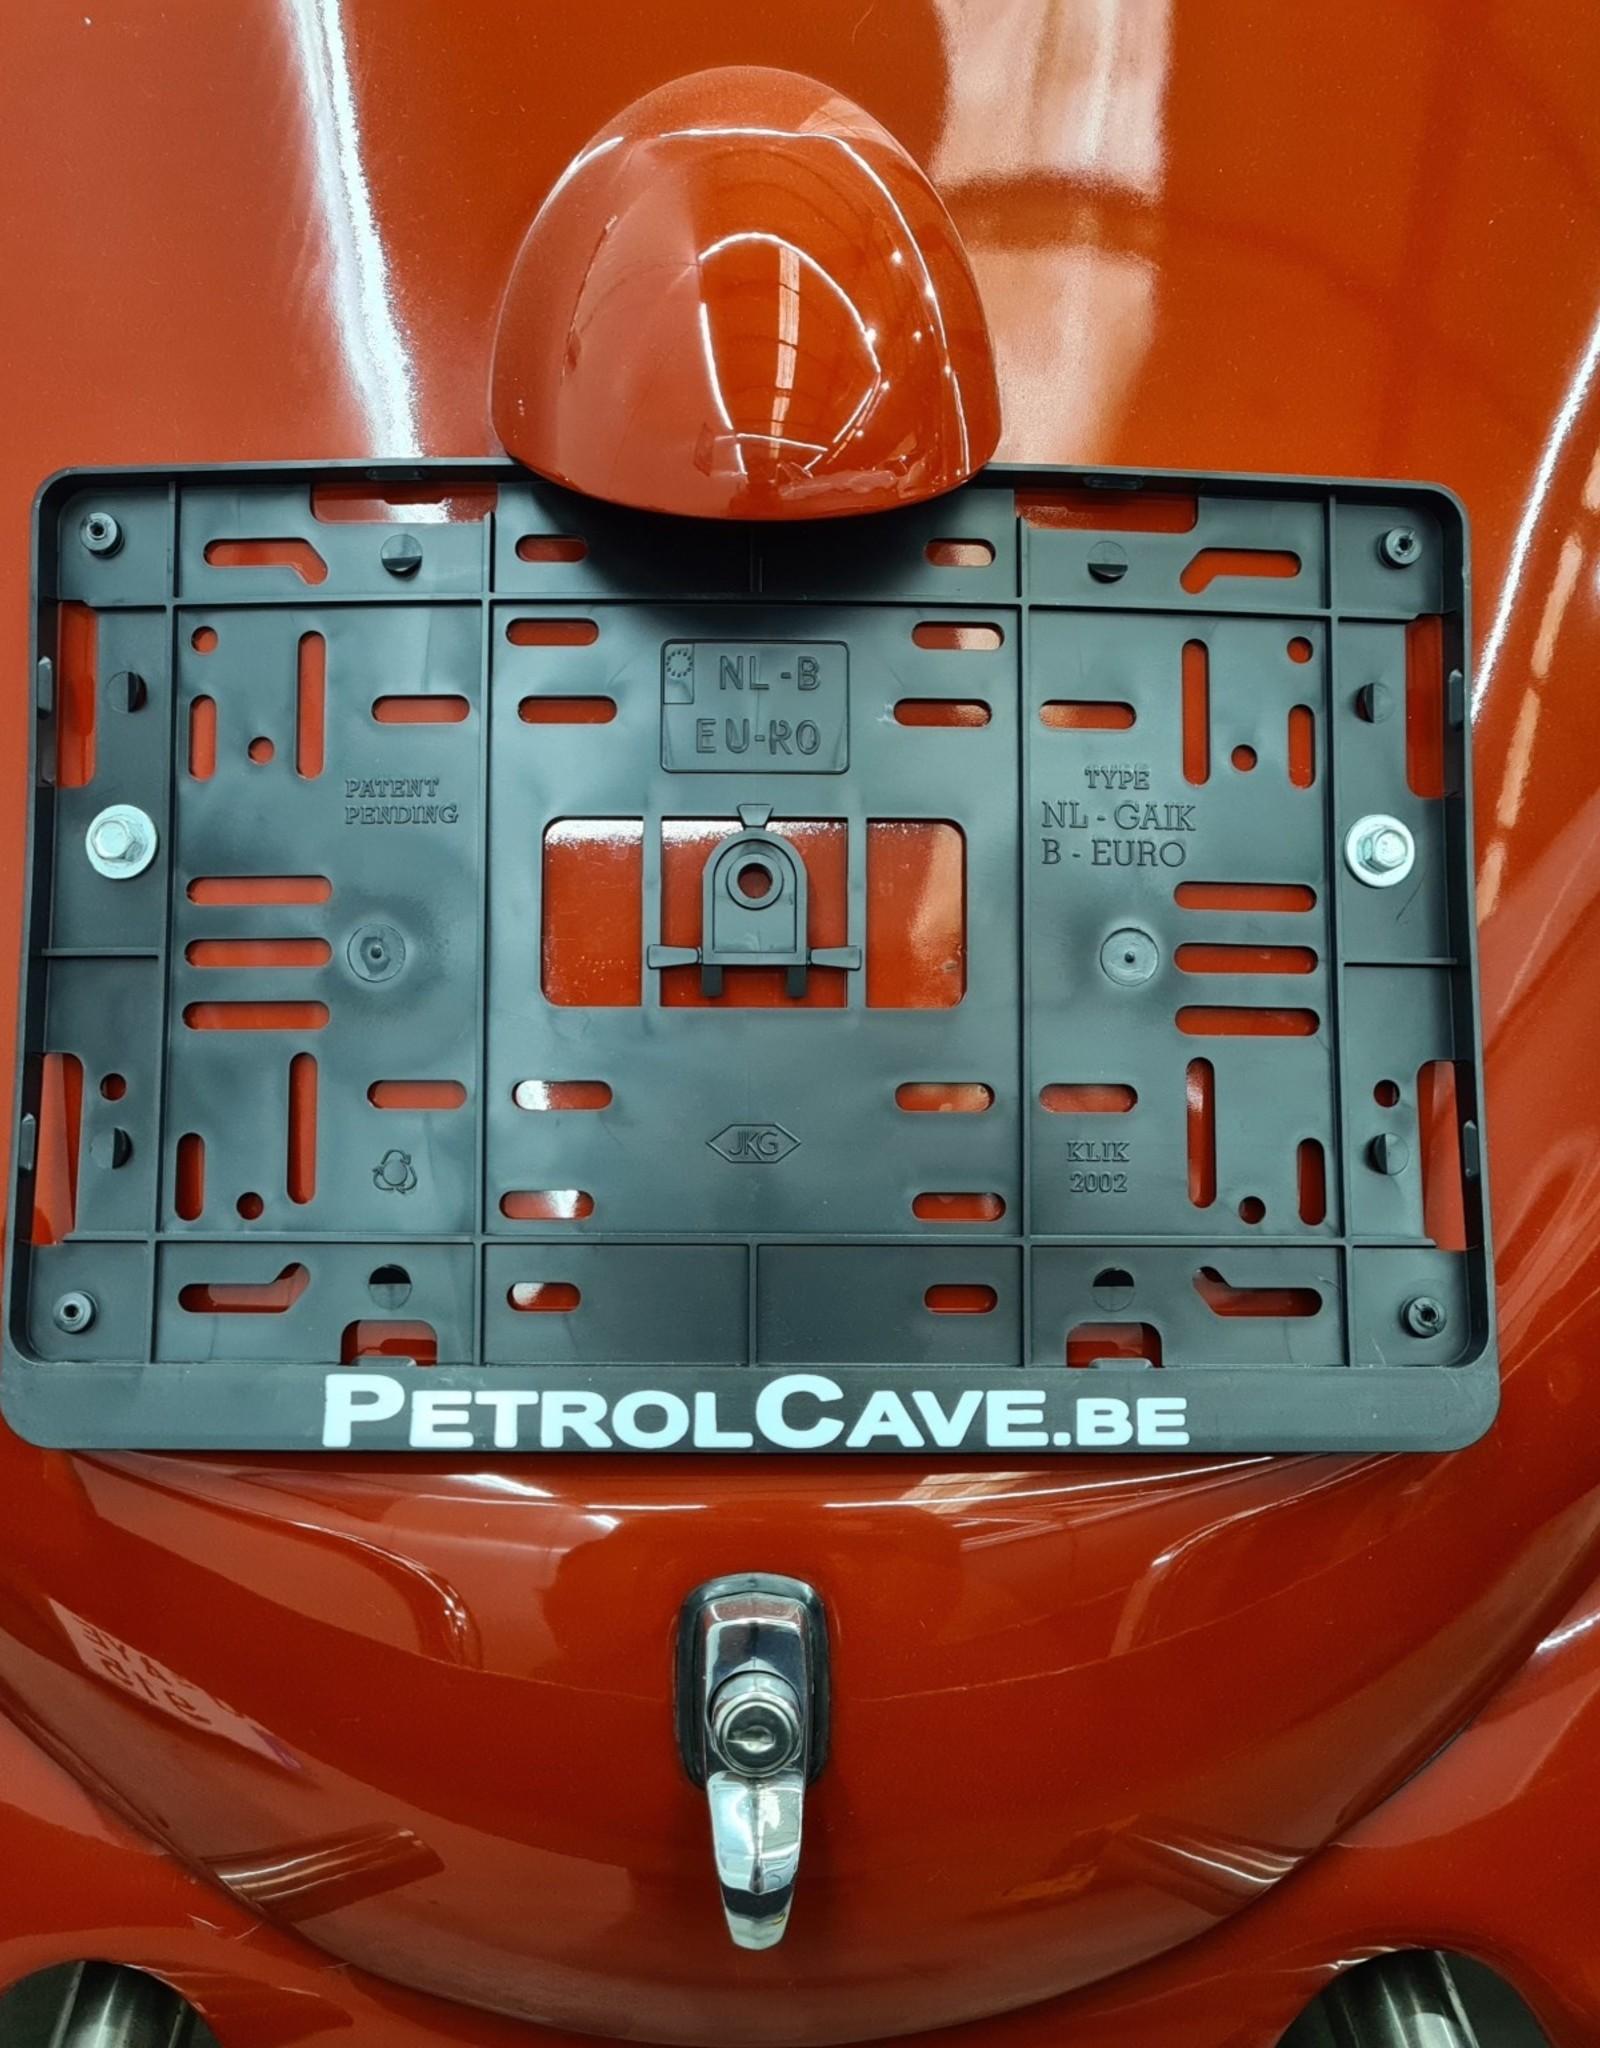 Petrol Cave Petrol Cave nummerplaathouder vierkant (34x21cm)